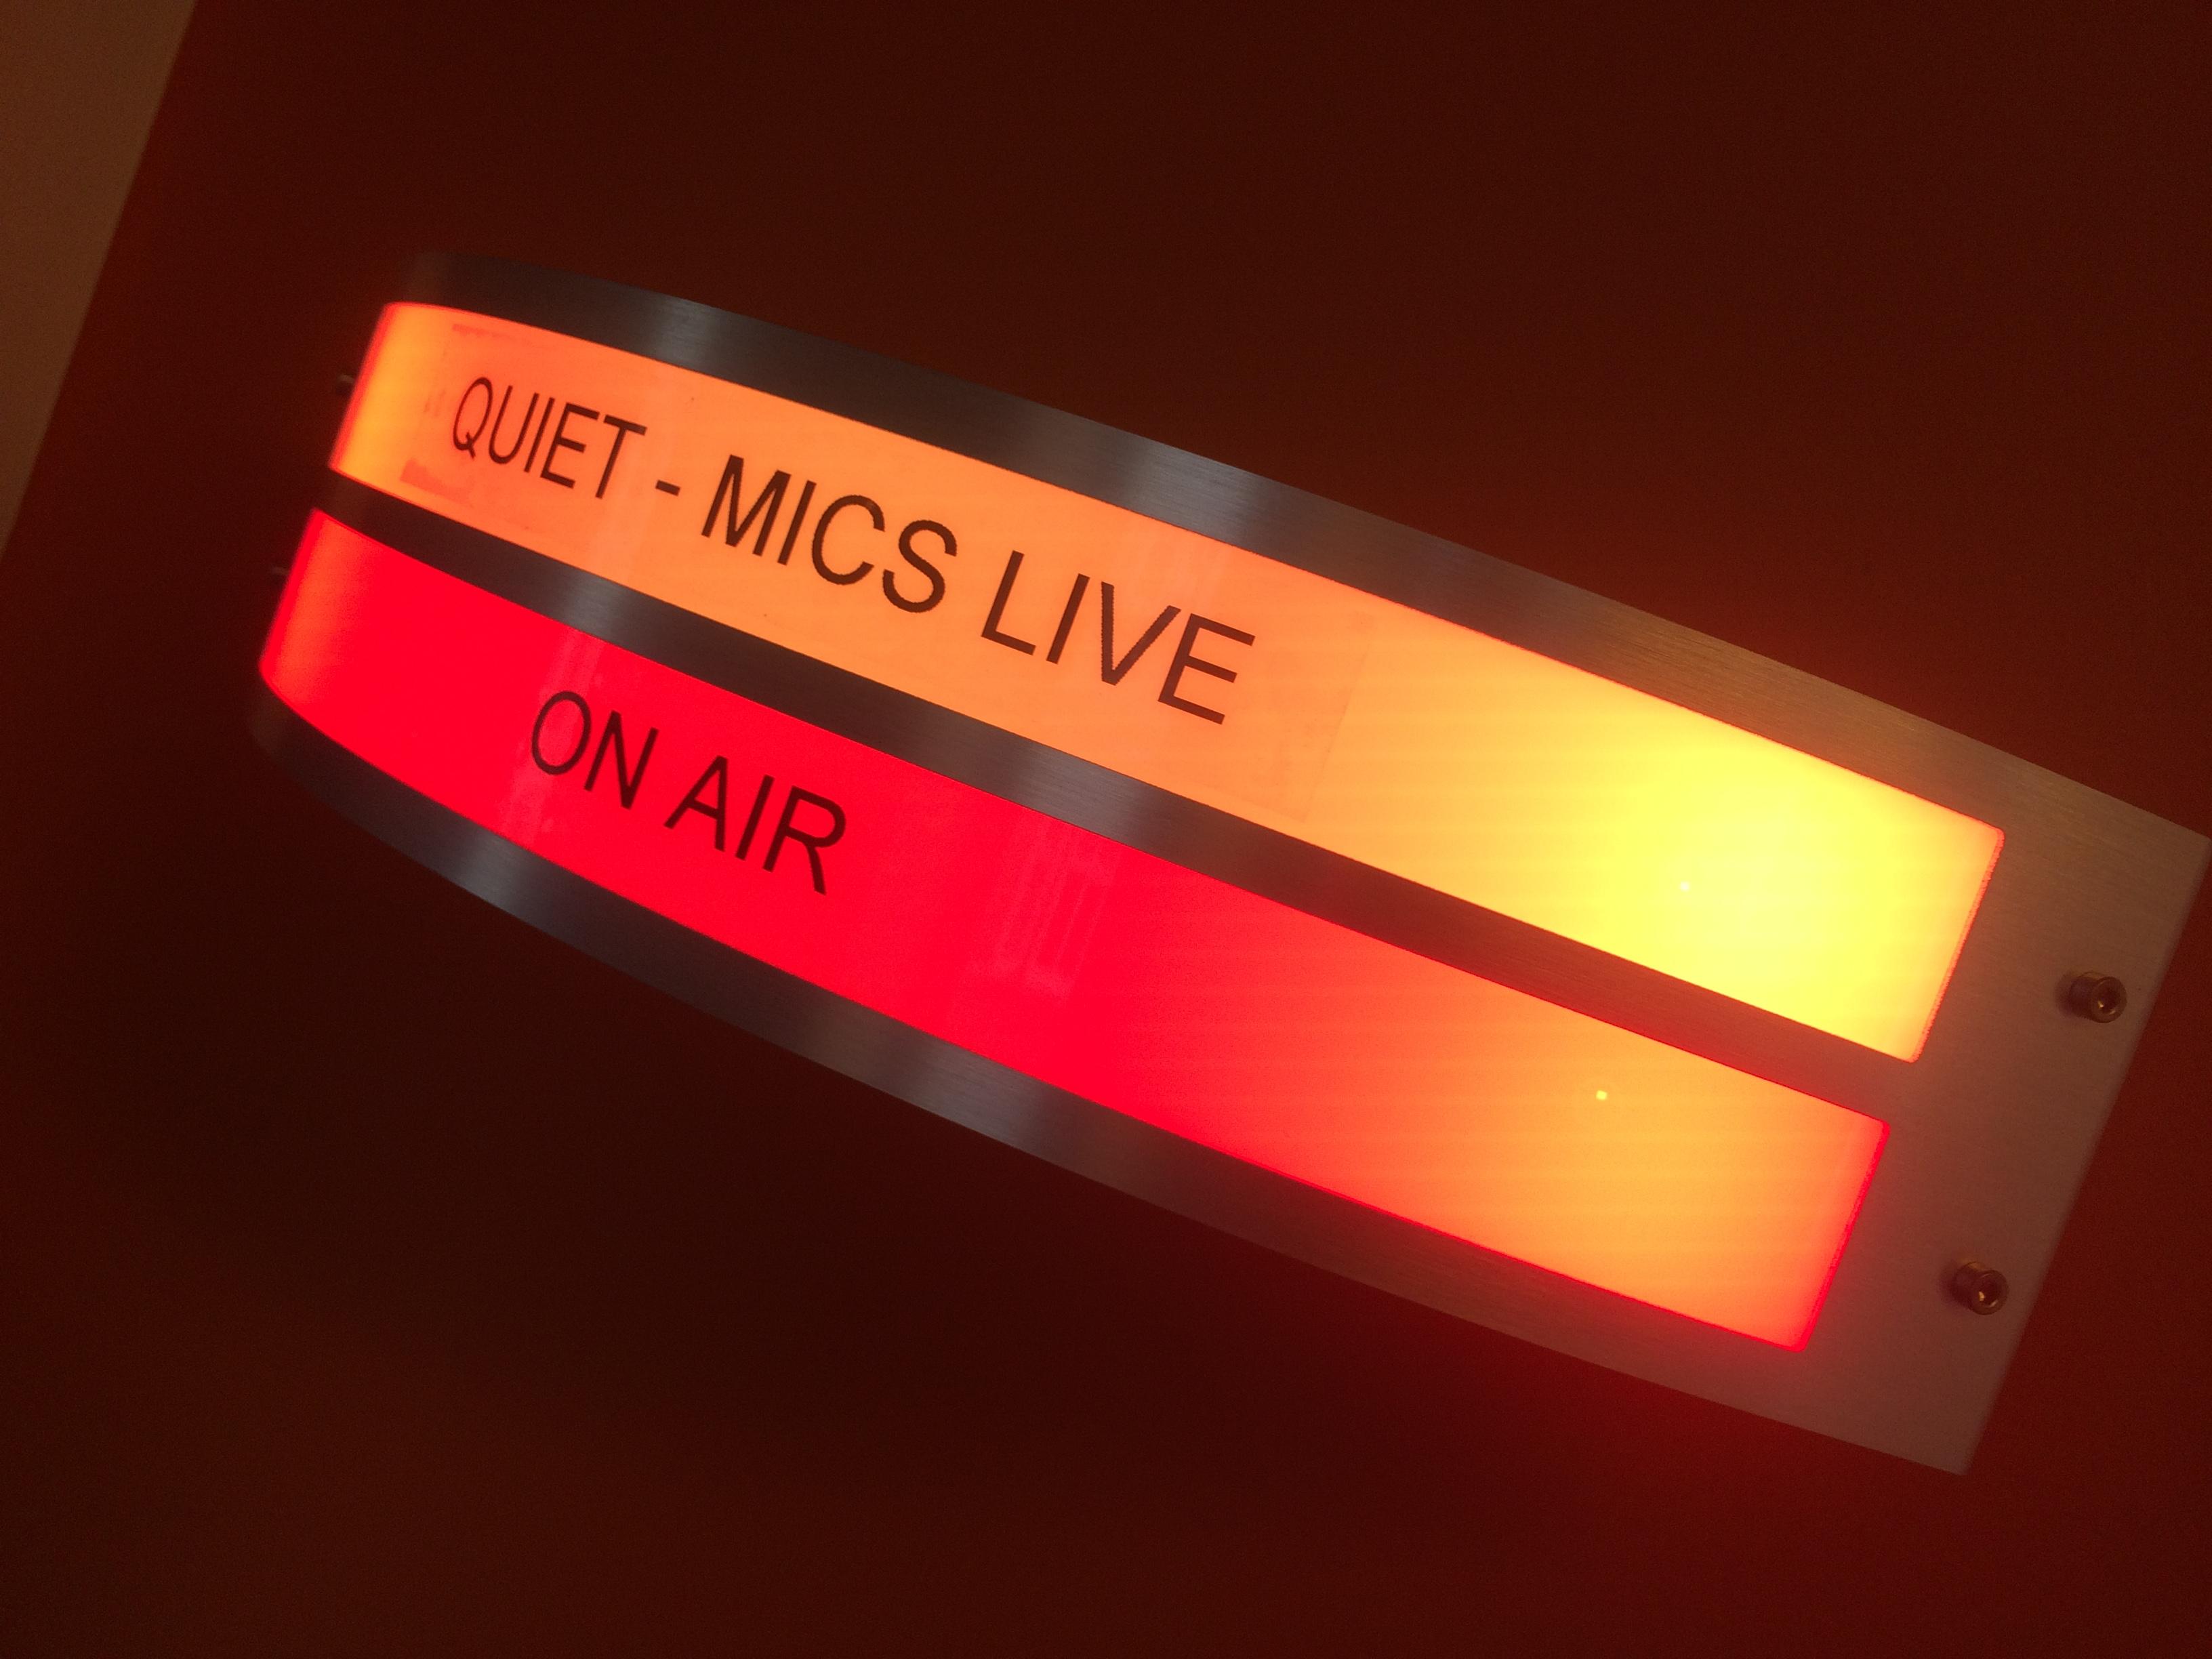 Quiet Mics Live On Air